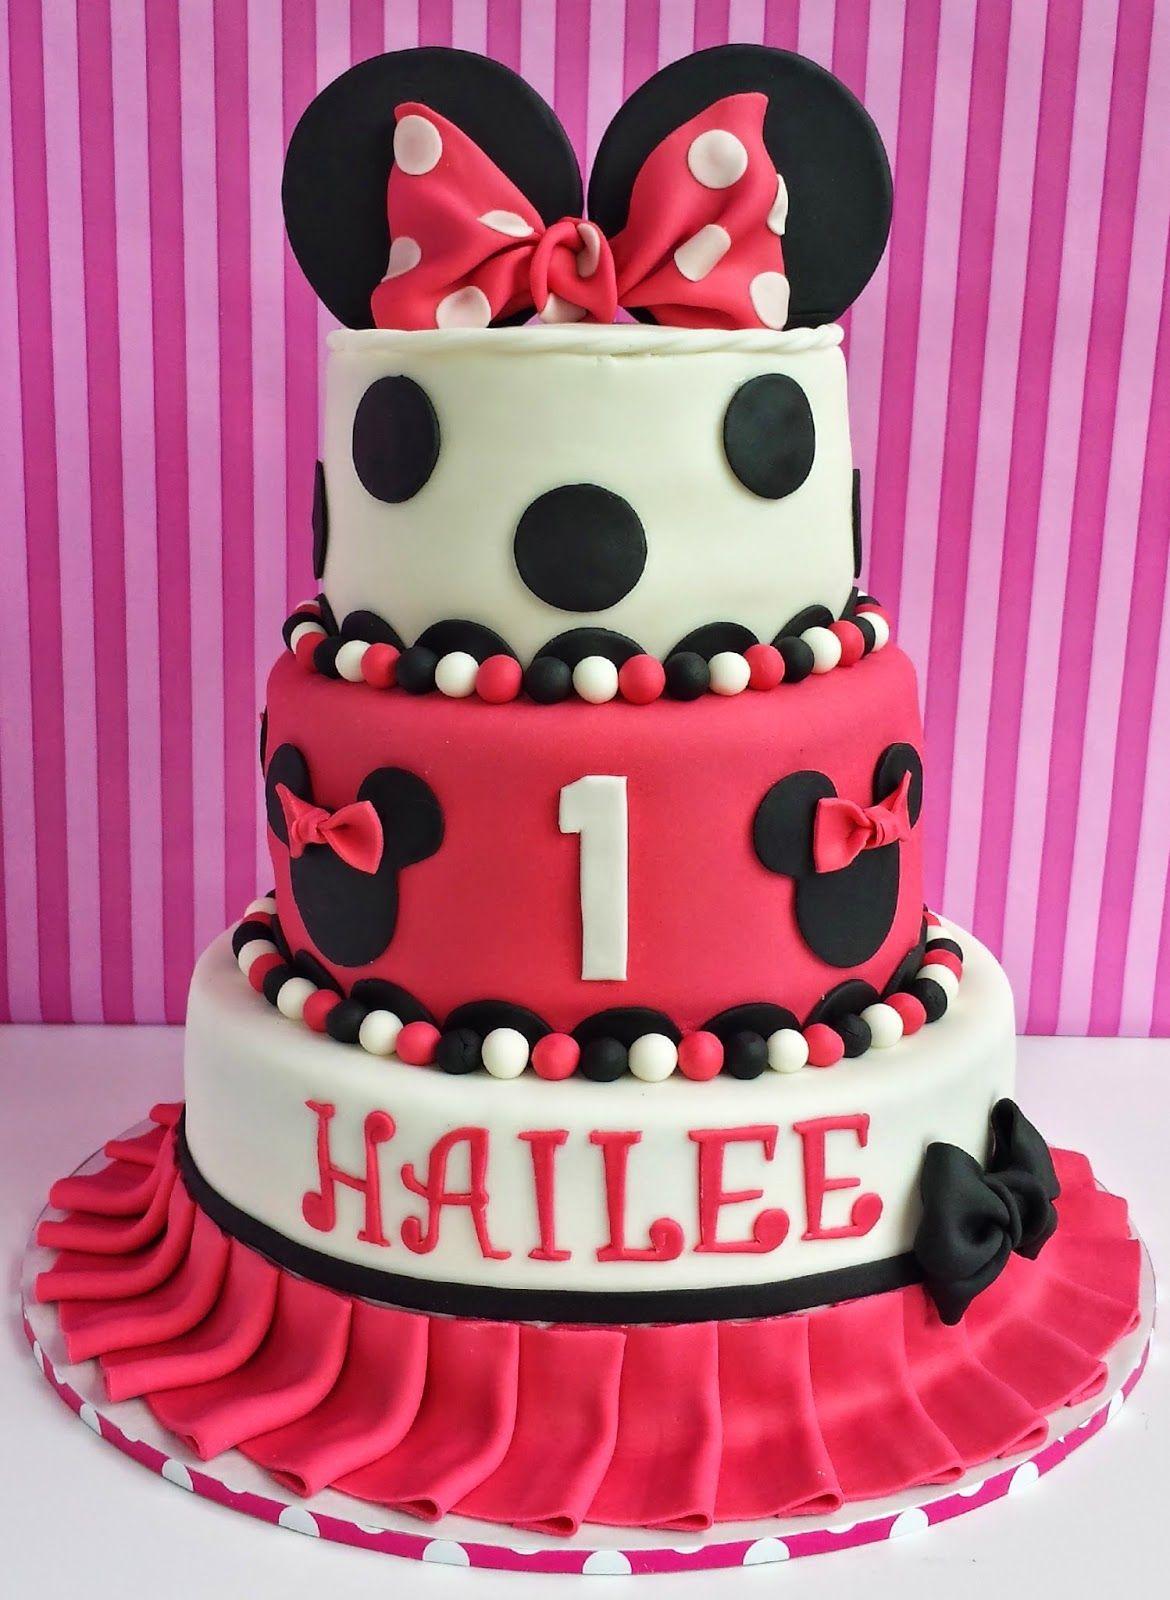 Cake Blog: Minnie Mouse Cake Tutorial Cake ideas ...